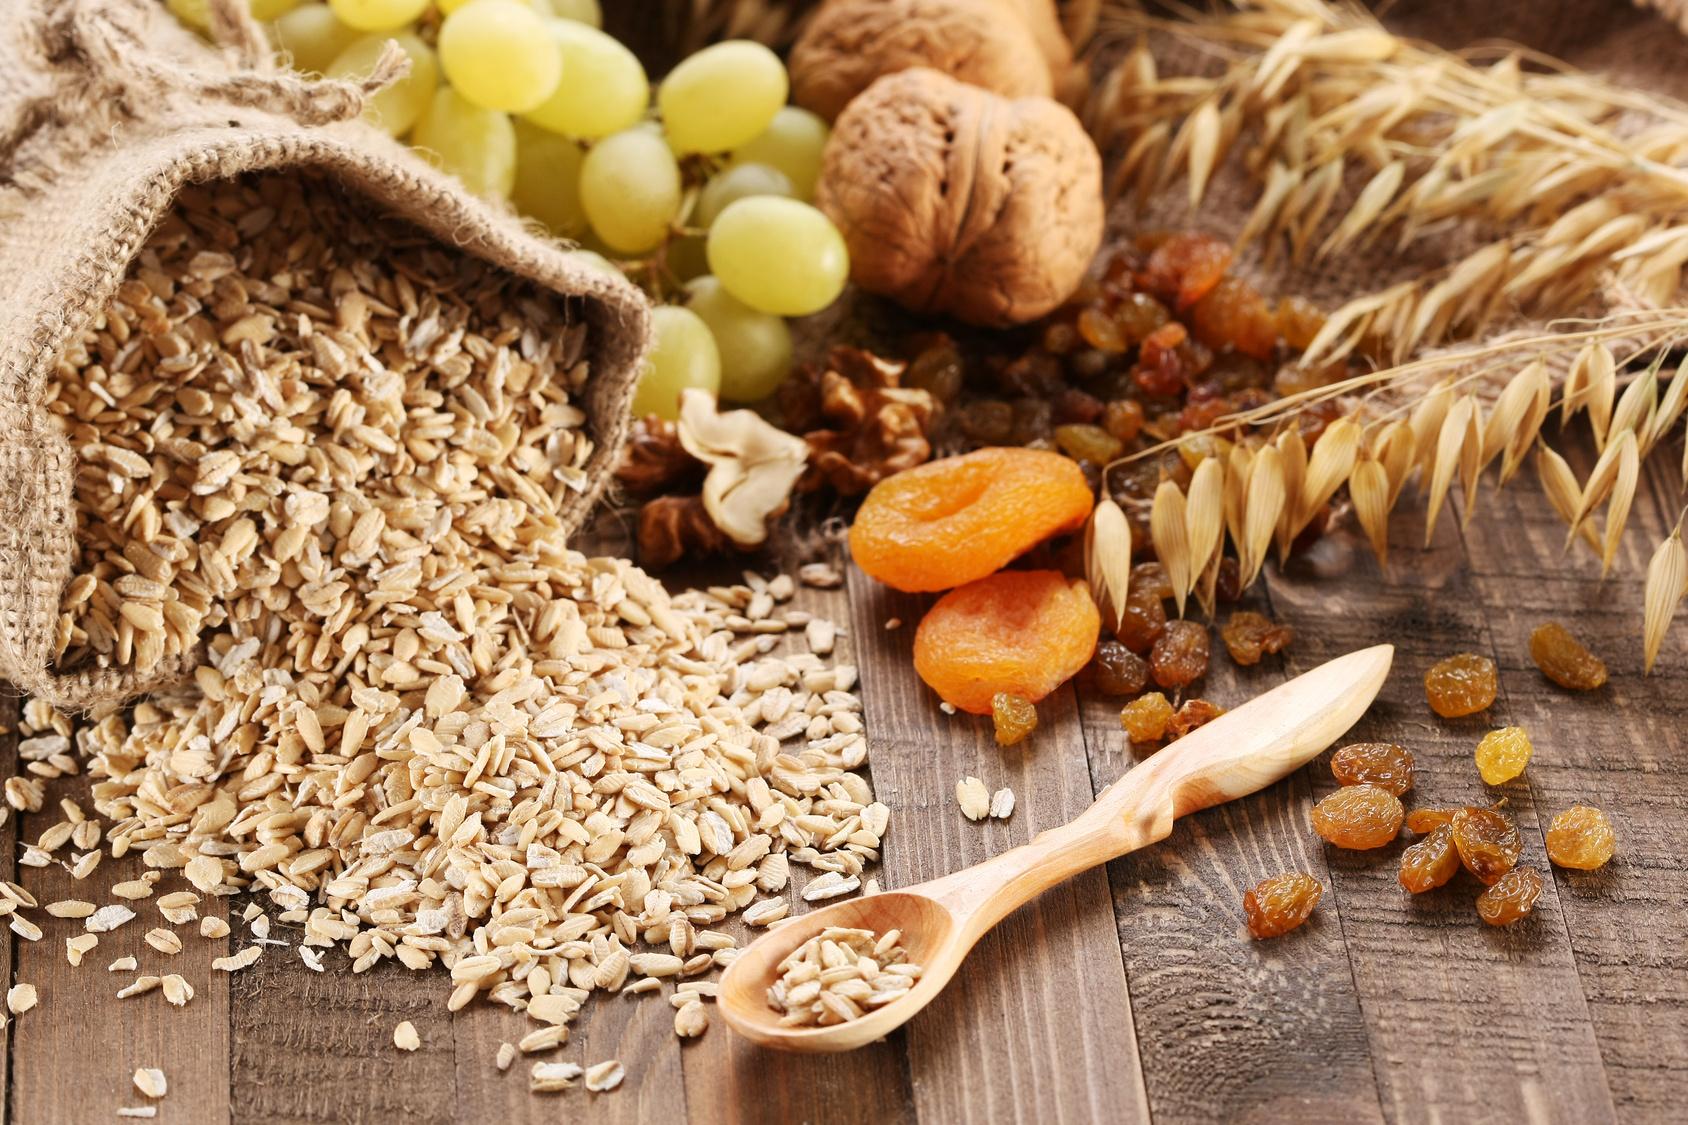 Delicious whole grain oats